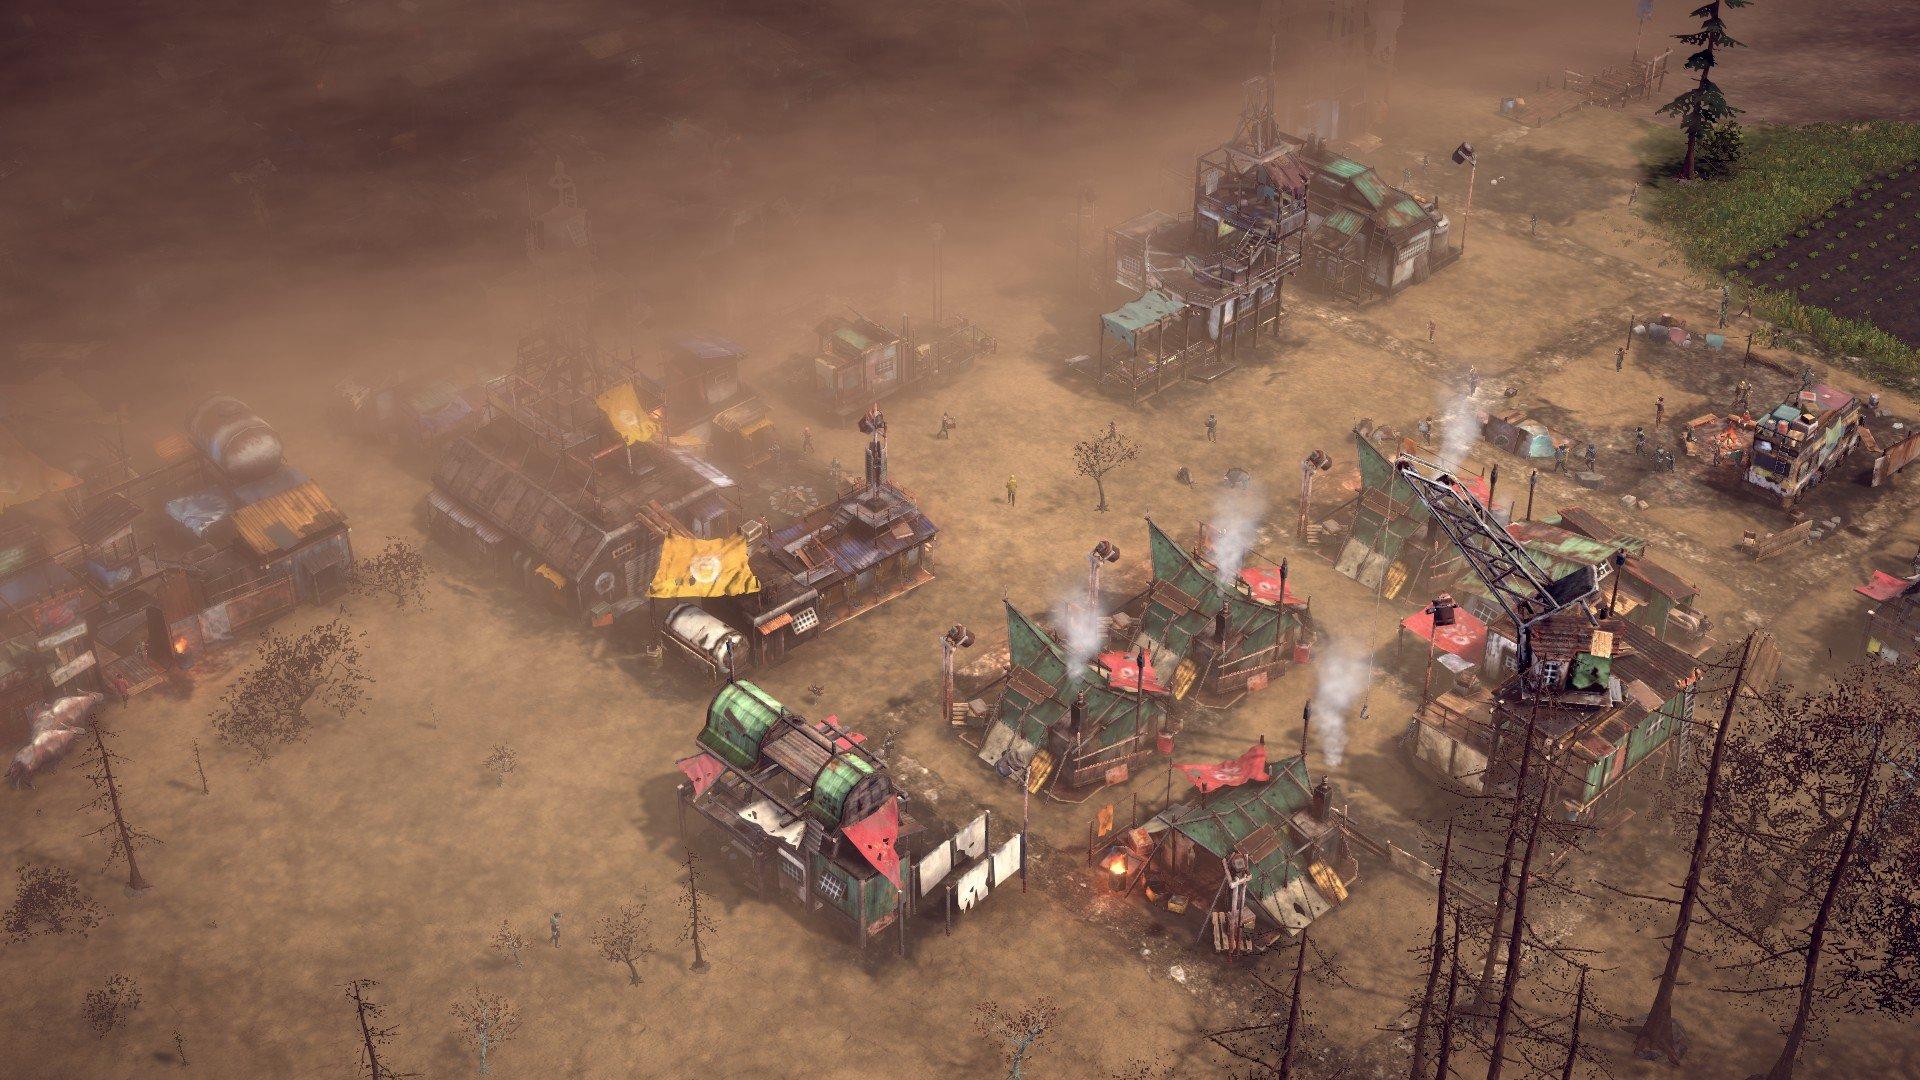 Endzone - A World Apart Sandstorm